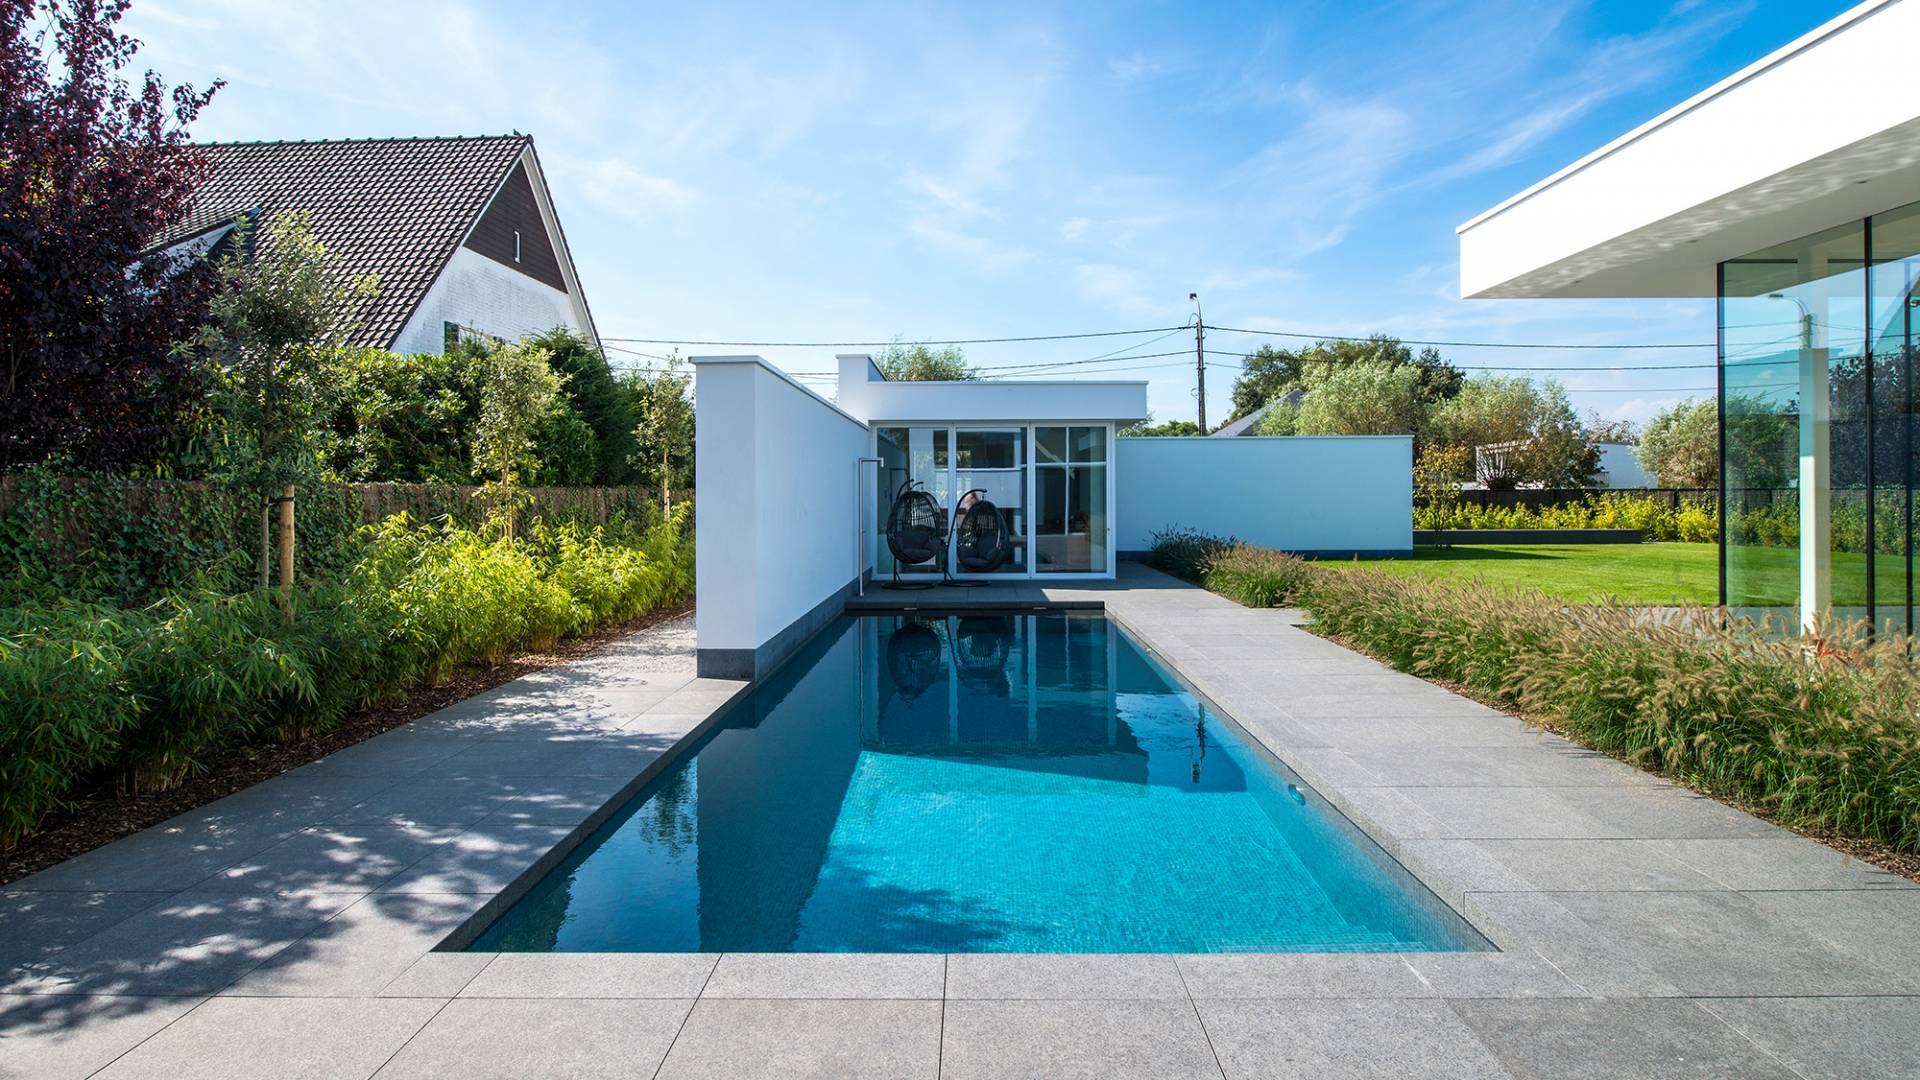 Huis muur zwembad waregem - Muur zwembad ...